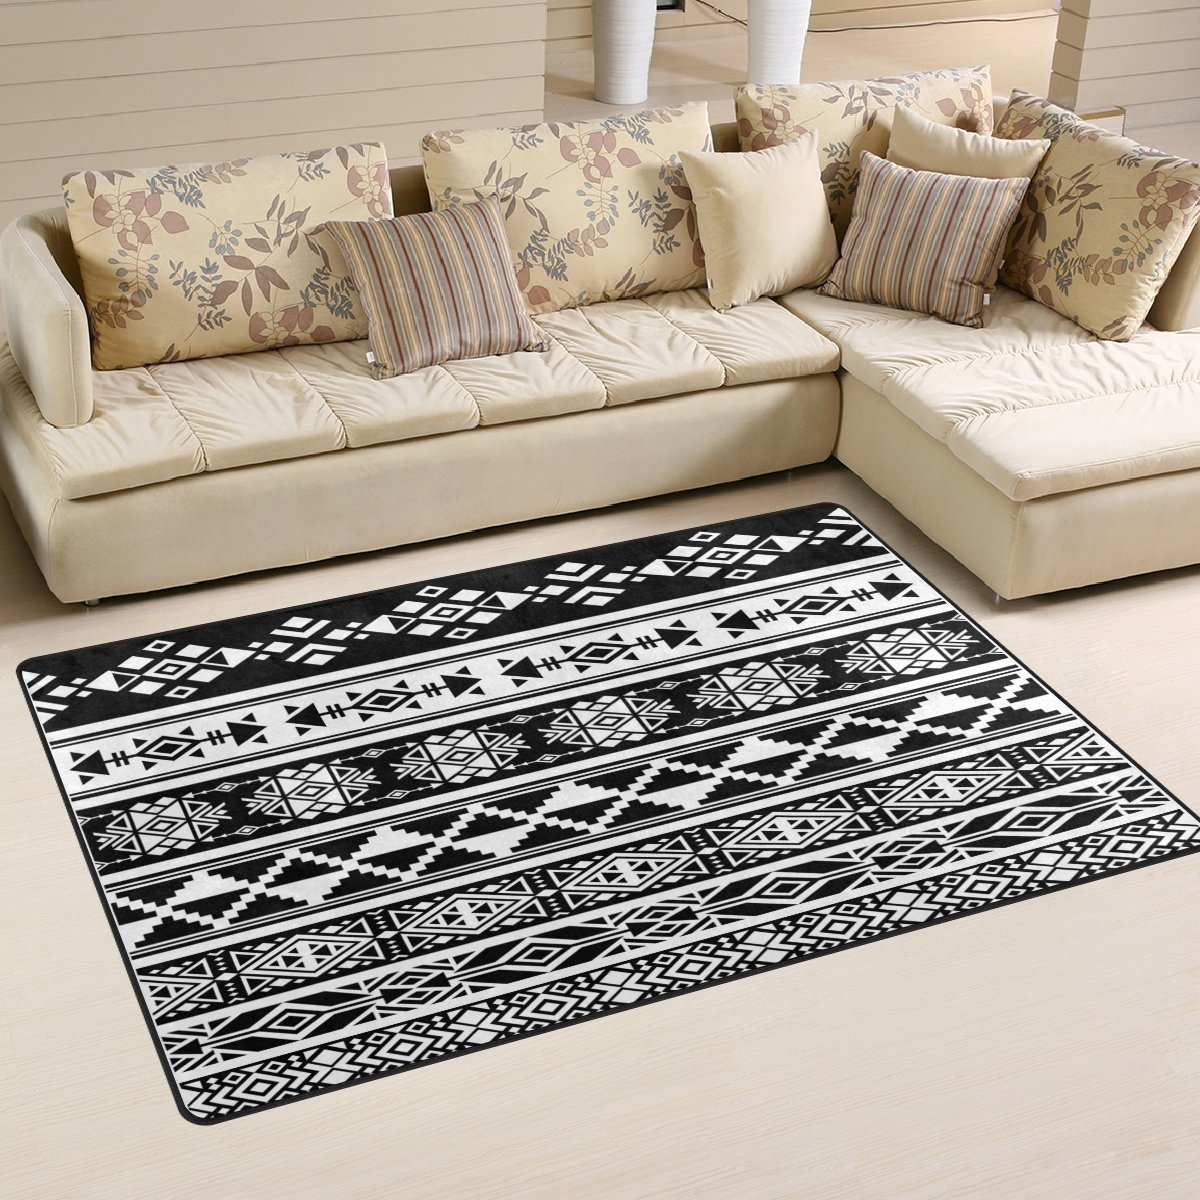 WOZO African and Mexican Aztec American Tribal Area Rug Rugs Non-Slip Floor Mat Doormats for Living Room Bedroom 60 x 39 inches